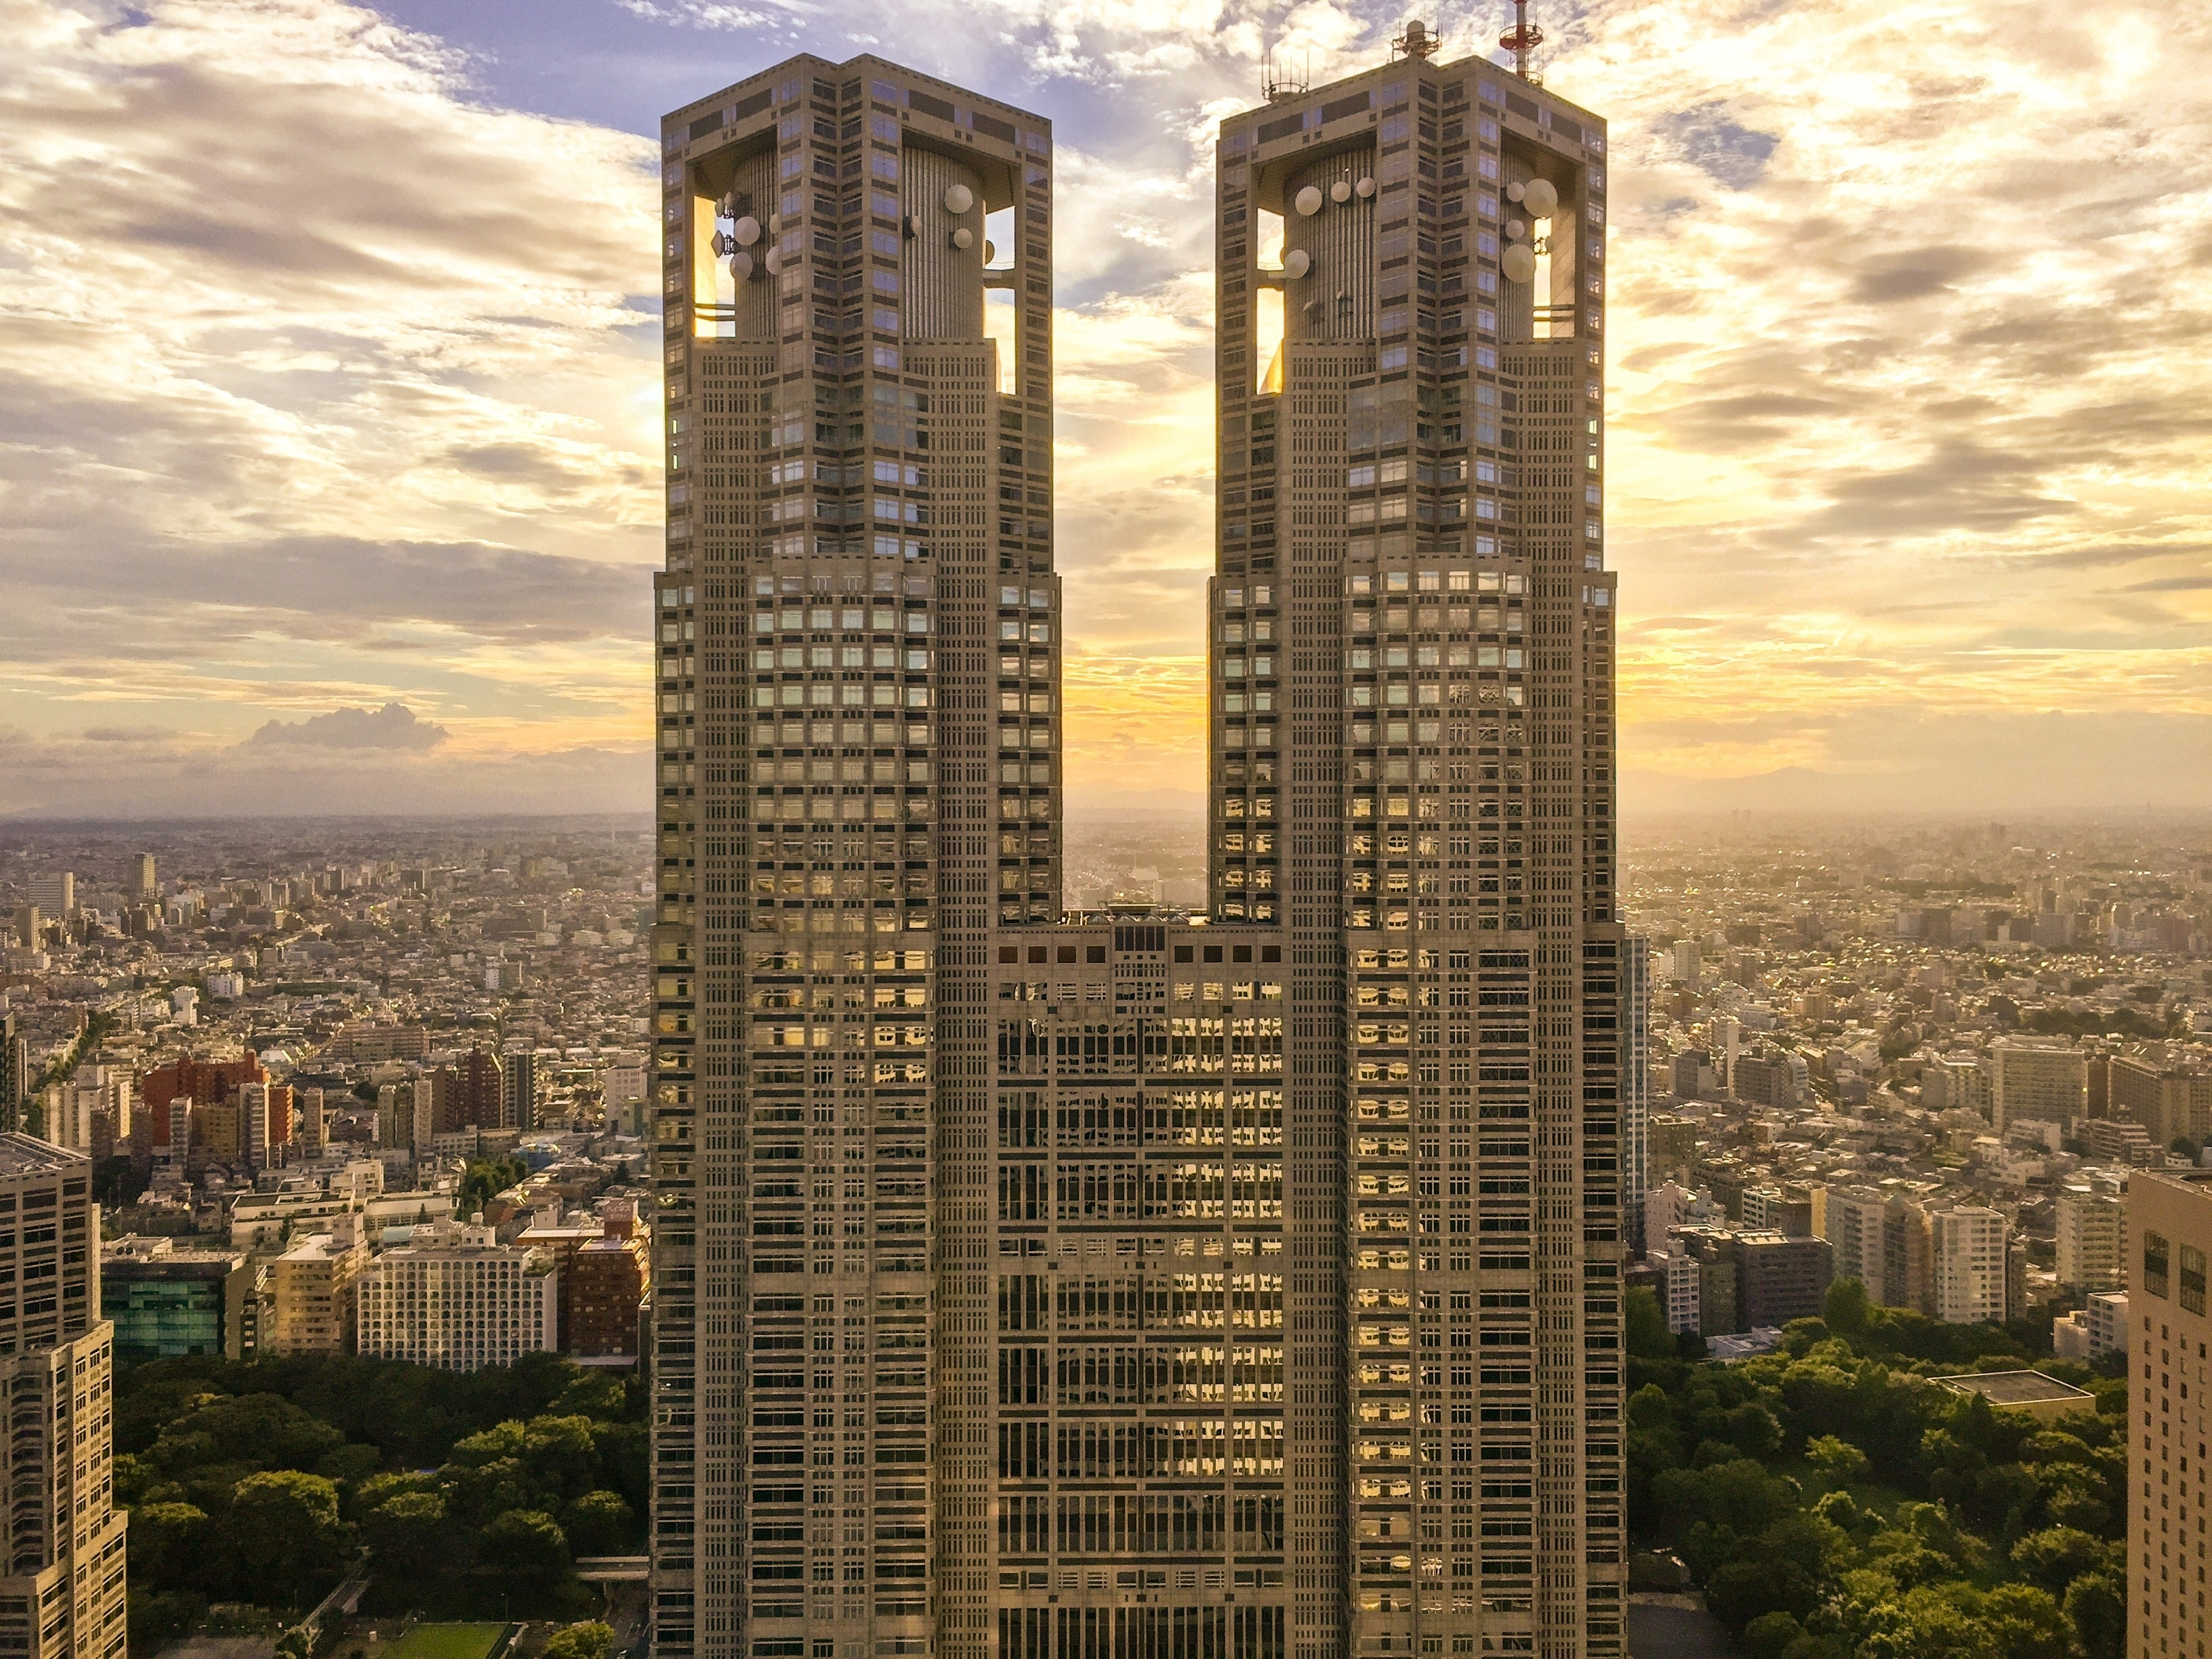 Regierungsgebäude der Präfektur Tokio, Tokio, Tokio (Präfektur), Japan